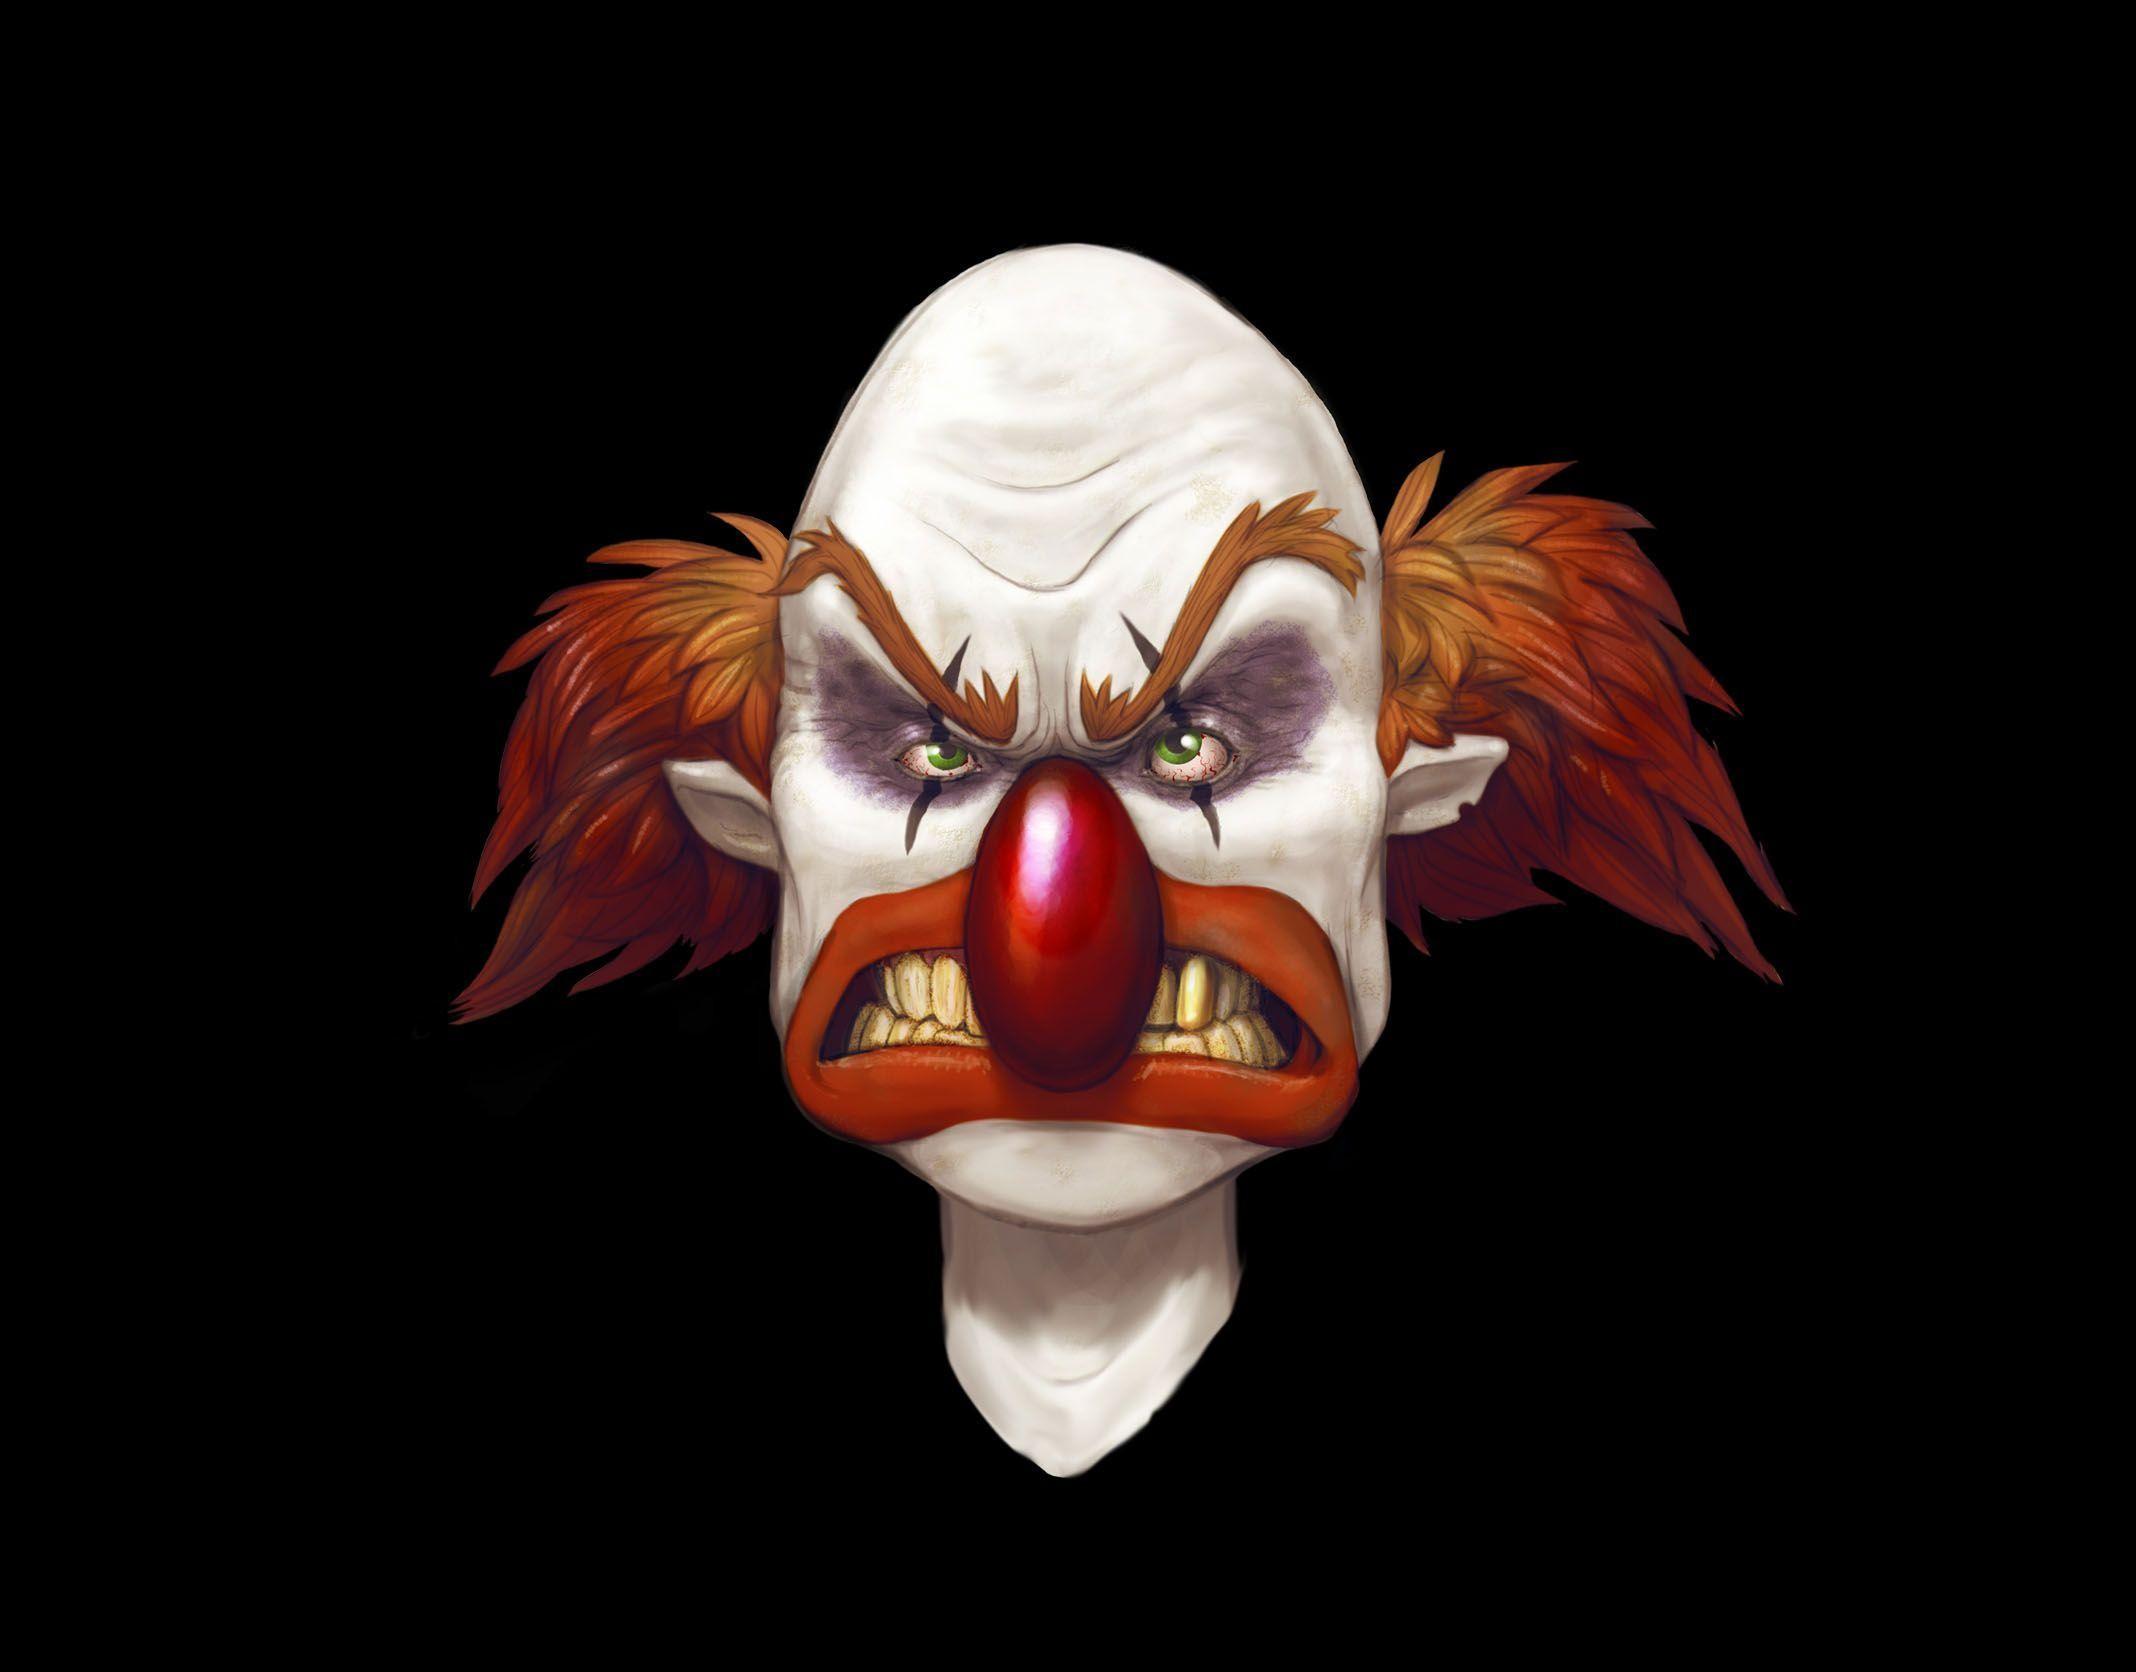 Clown Fish Wallpaper Iphone 6 Plus Scary Clown Wallpaper Screensavers 61 Images